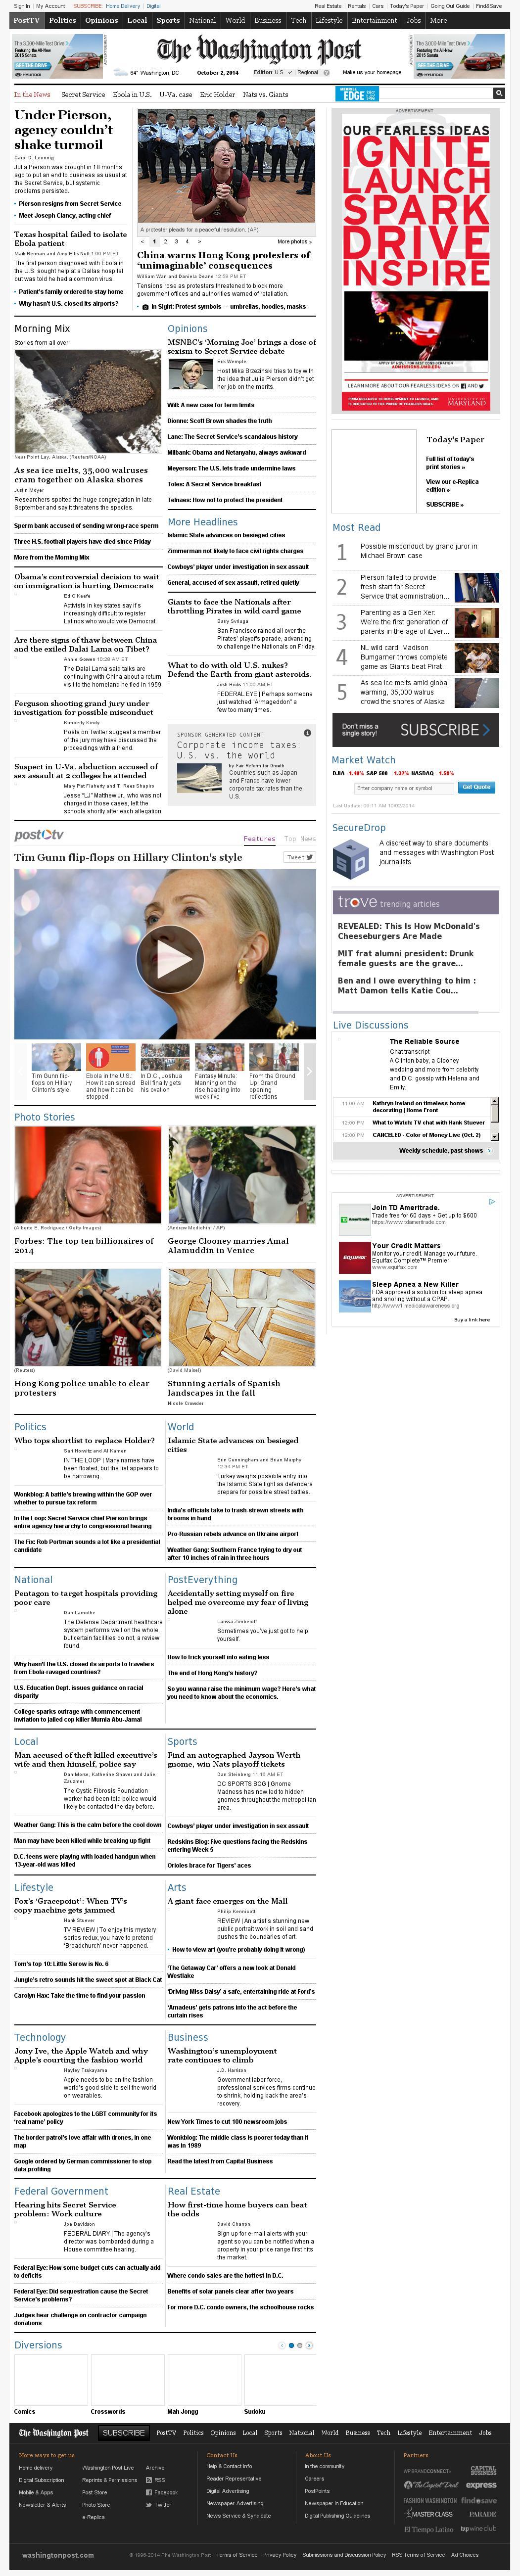 The Washington Post at Thursday Oct. 2, 2014, 1:16 p.m. UTC